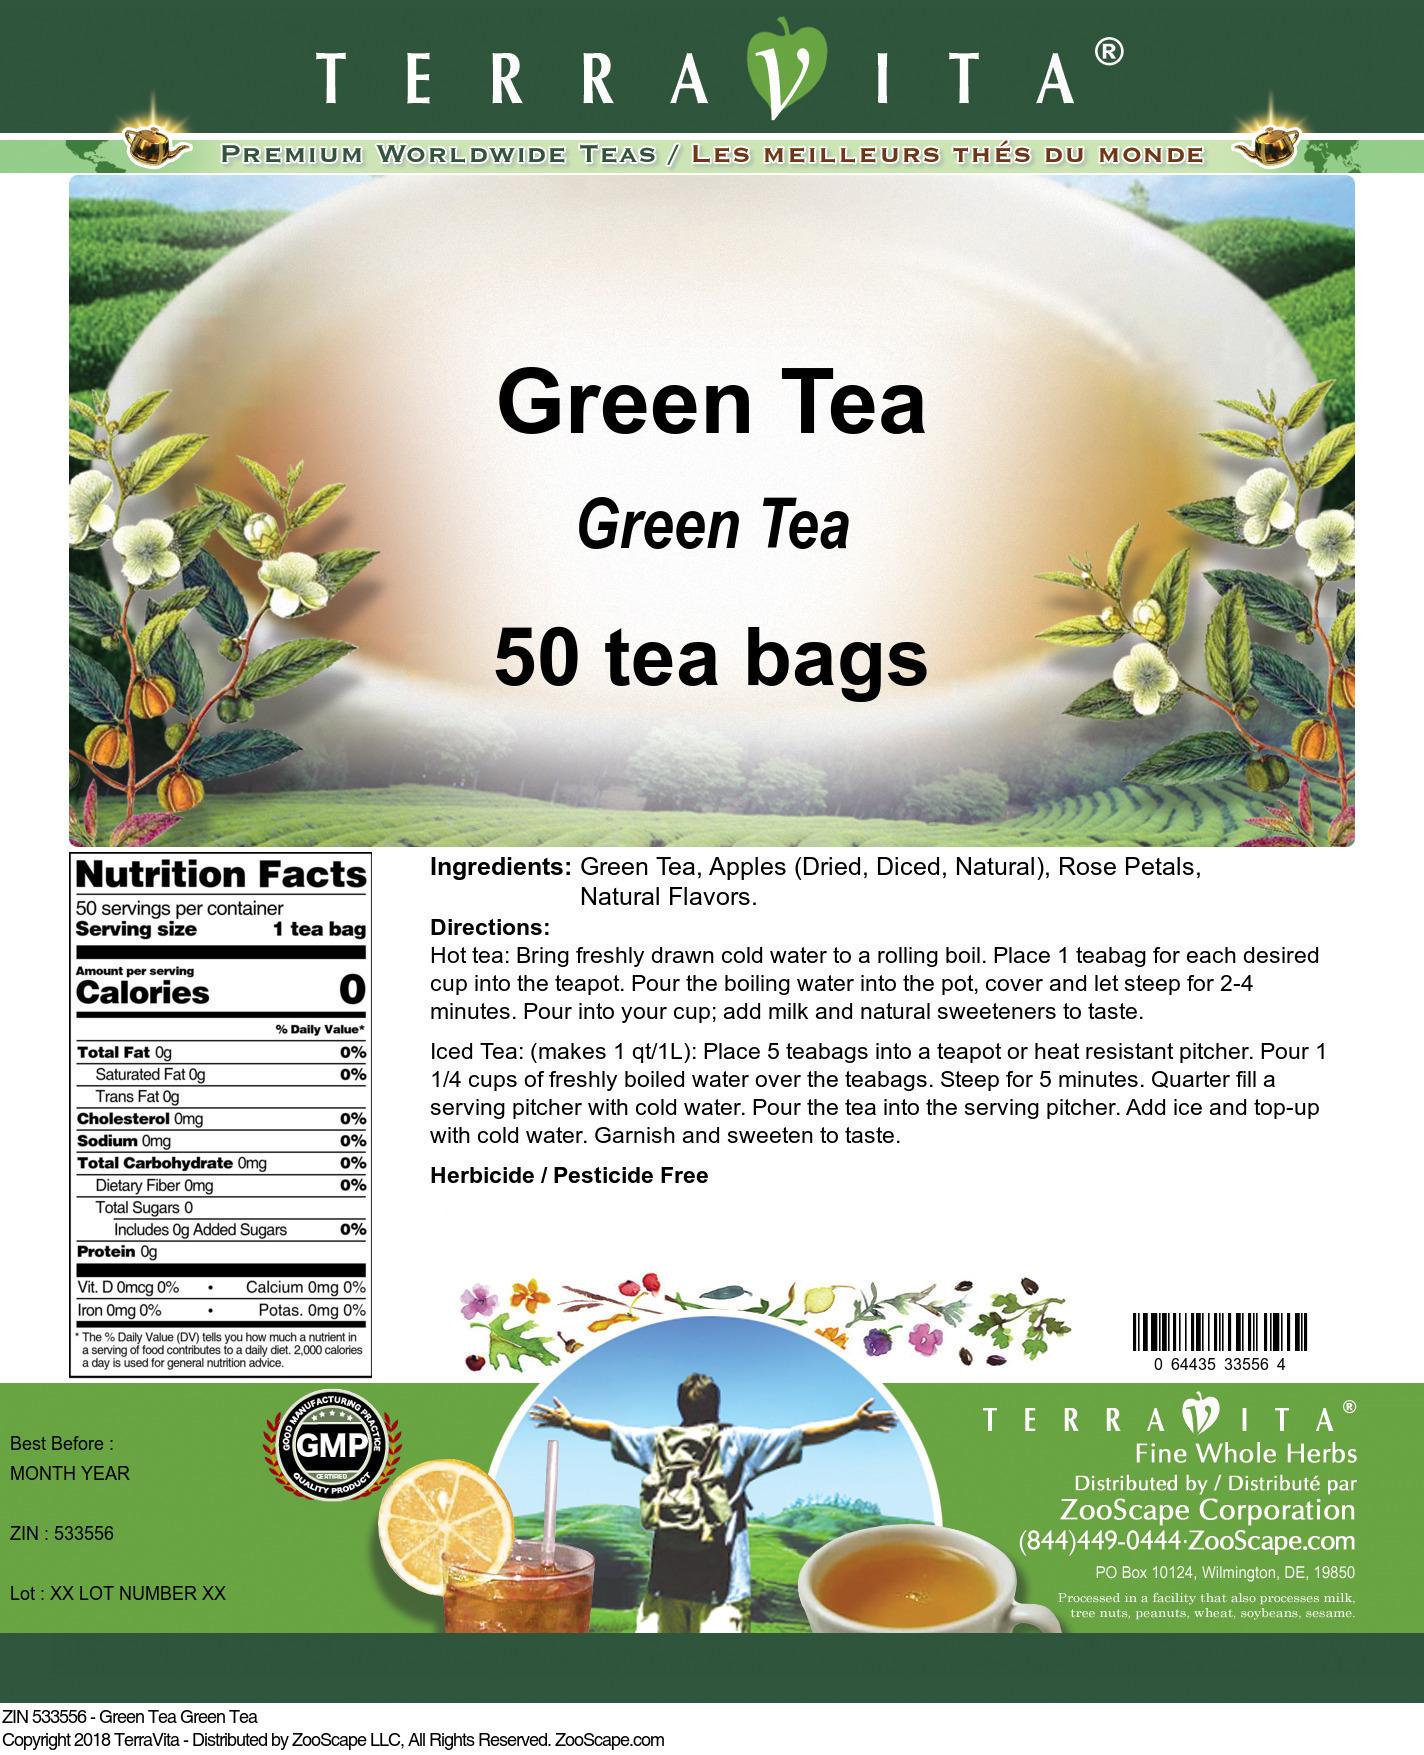 Green Tea Green Tea